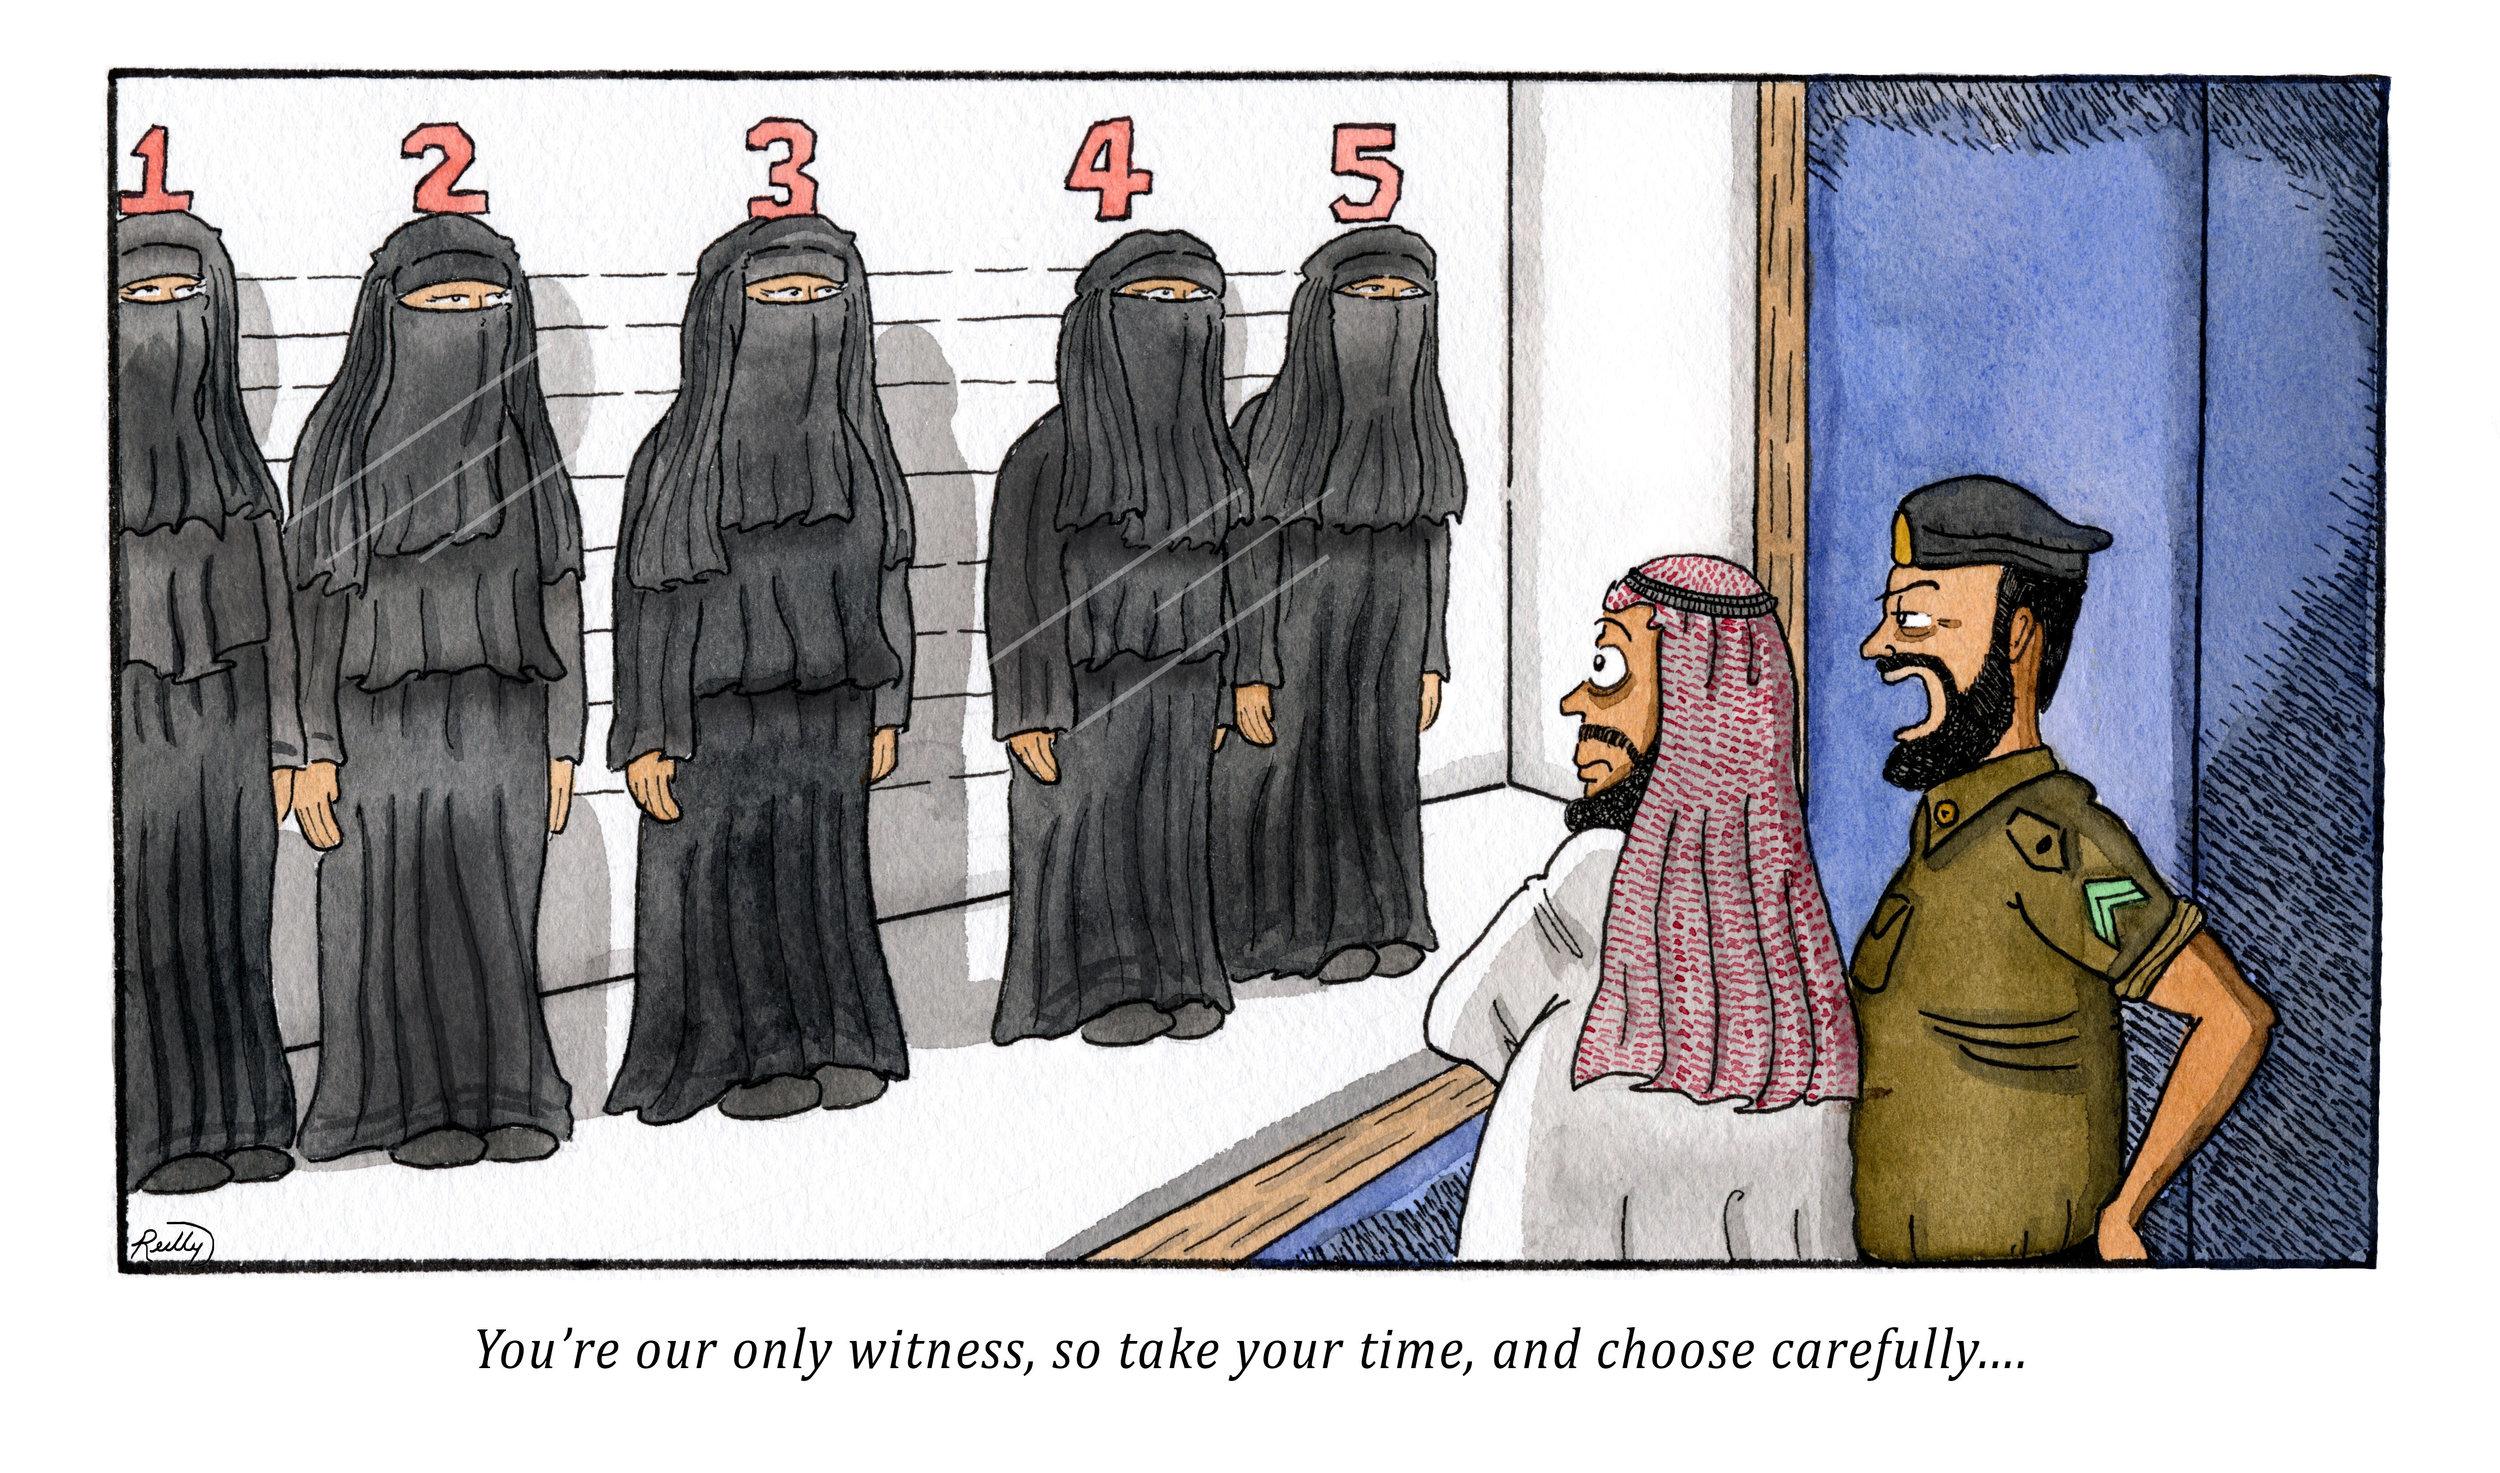 burqa_lineup.jpg